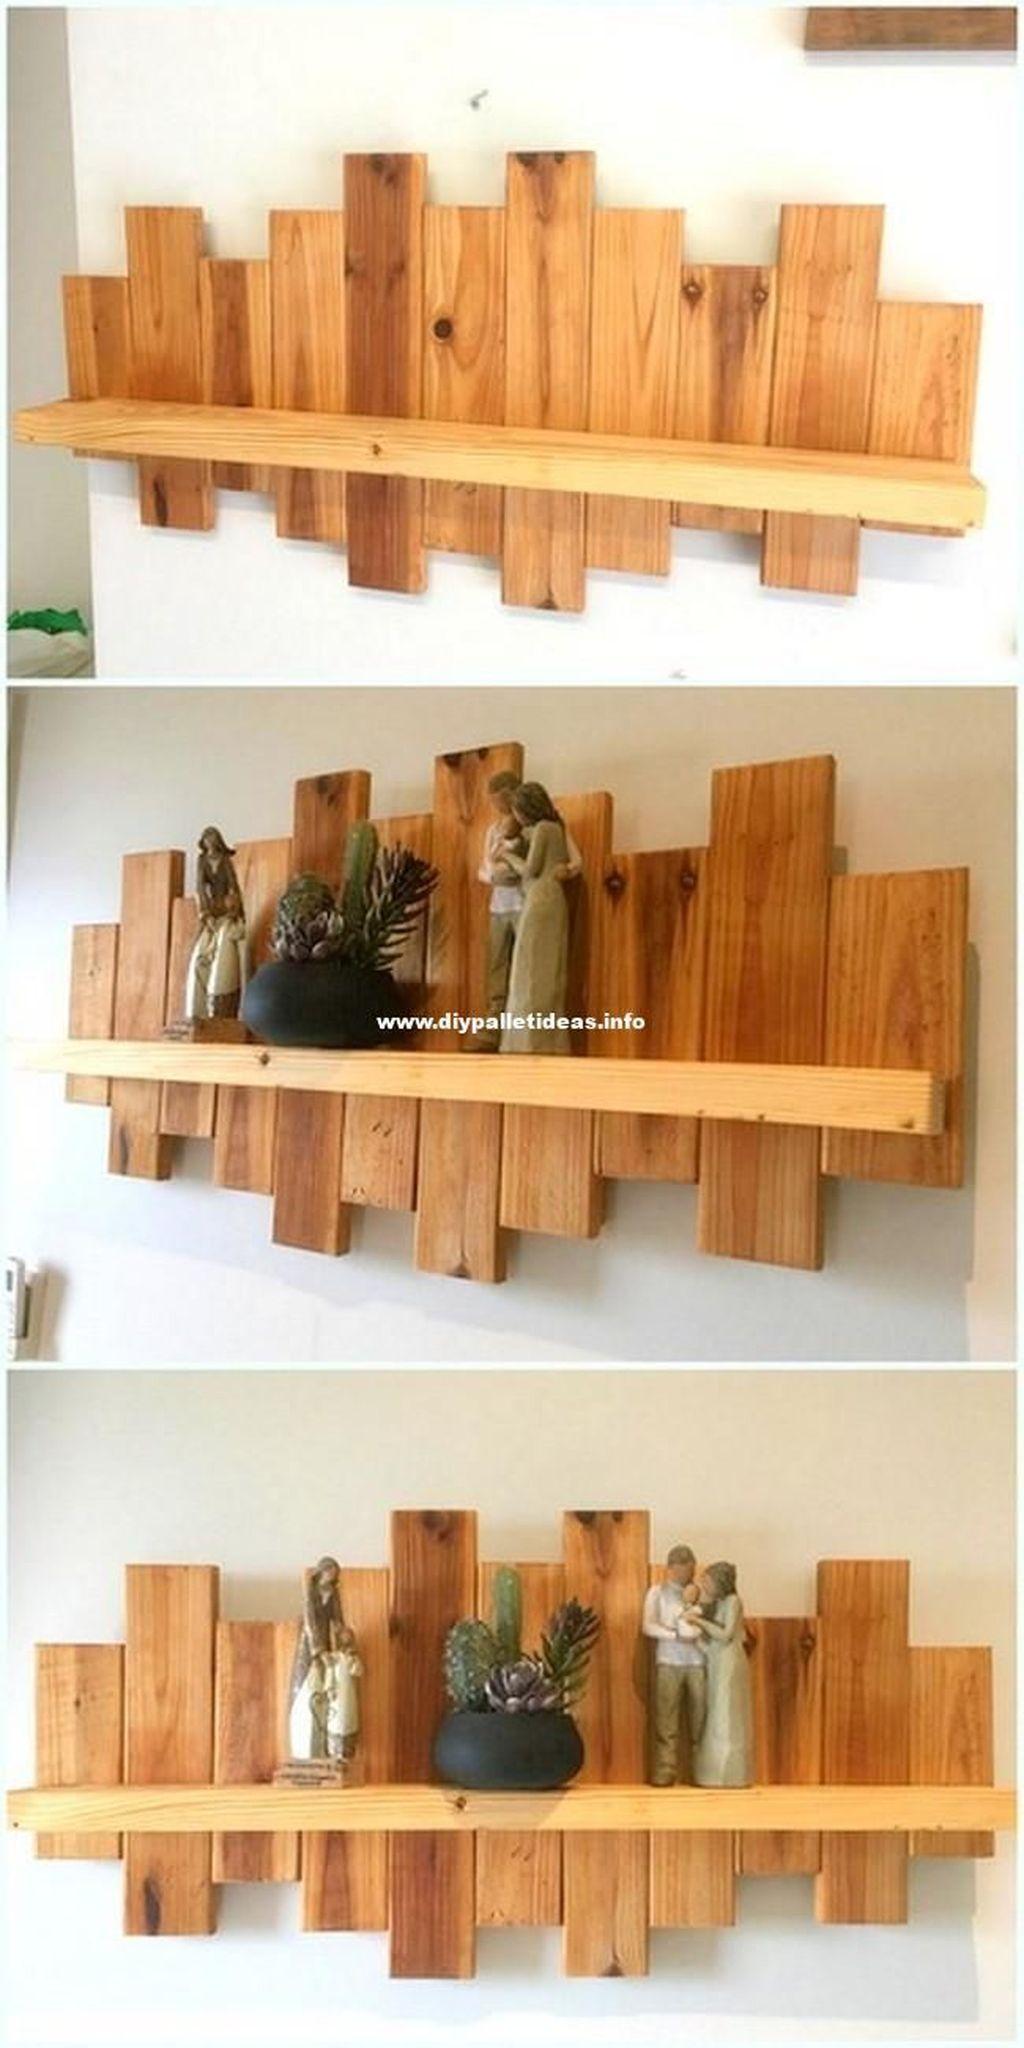 38 Graceful Diy Wooden Pallet Design Ideas To Try Asap Pallet